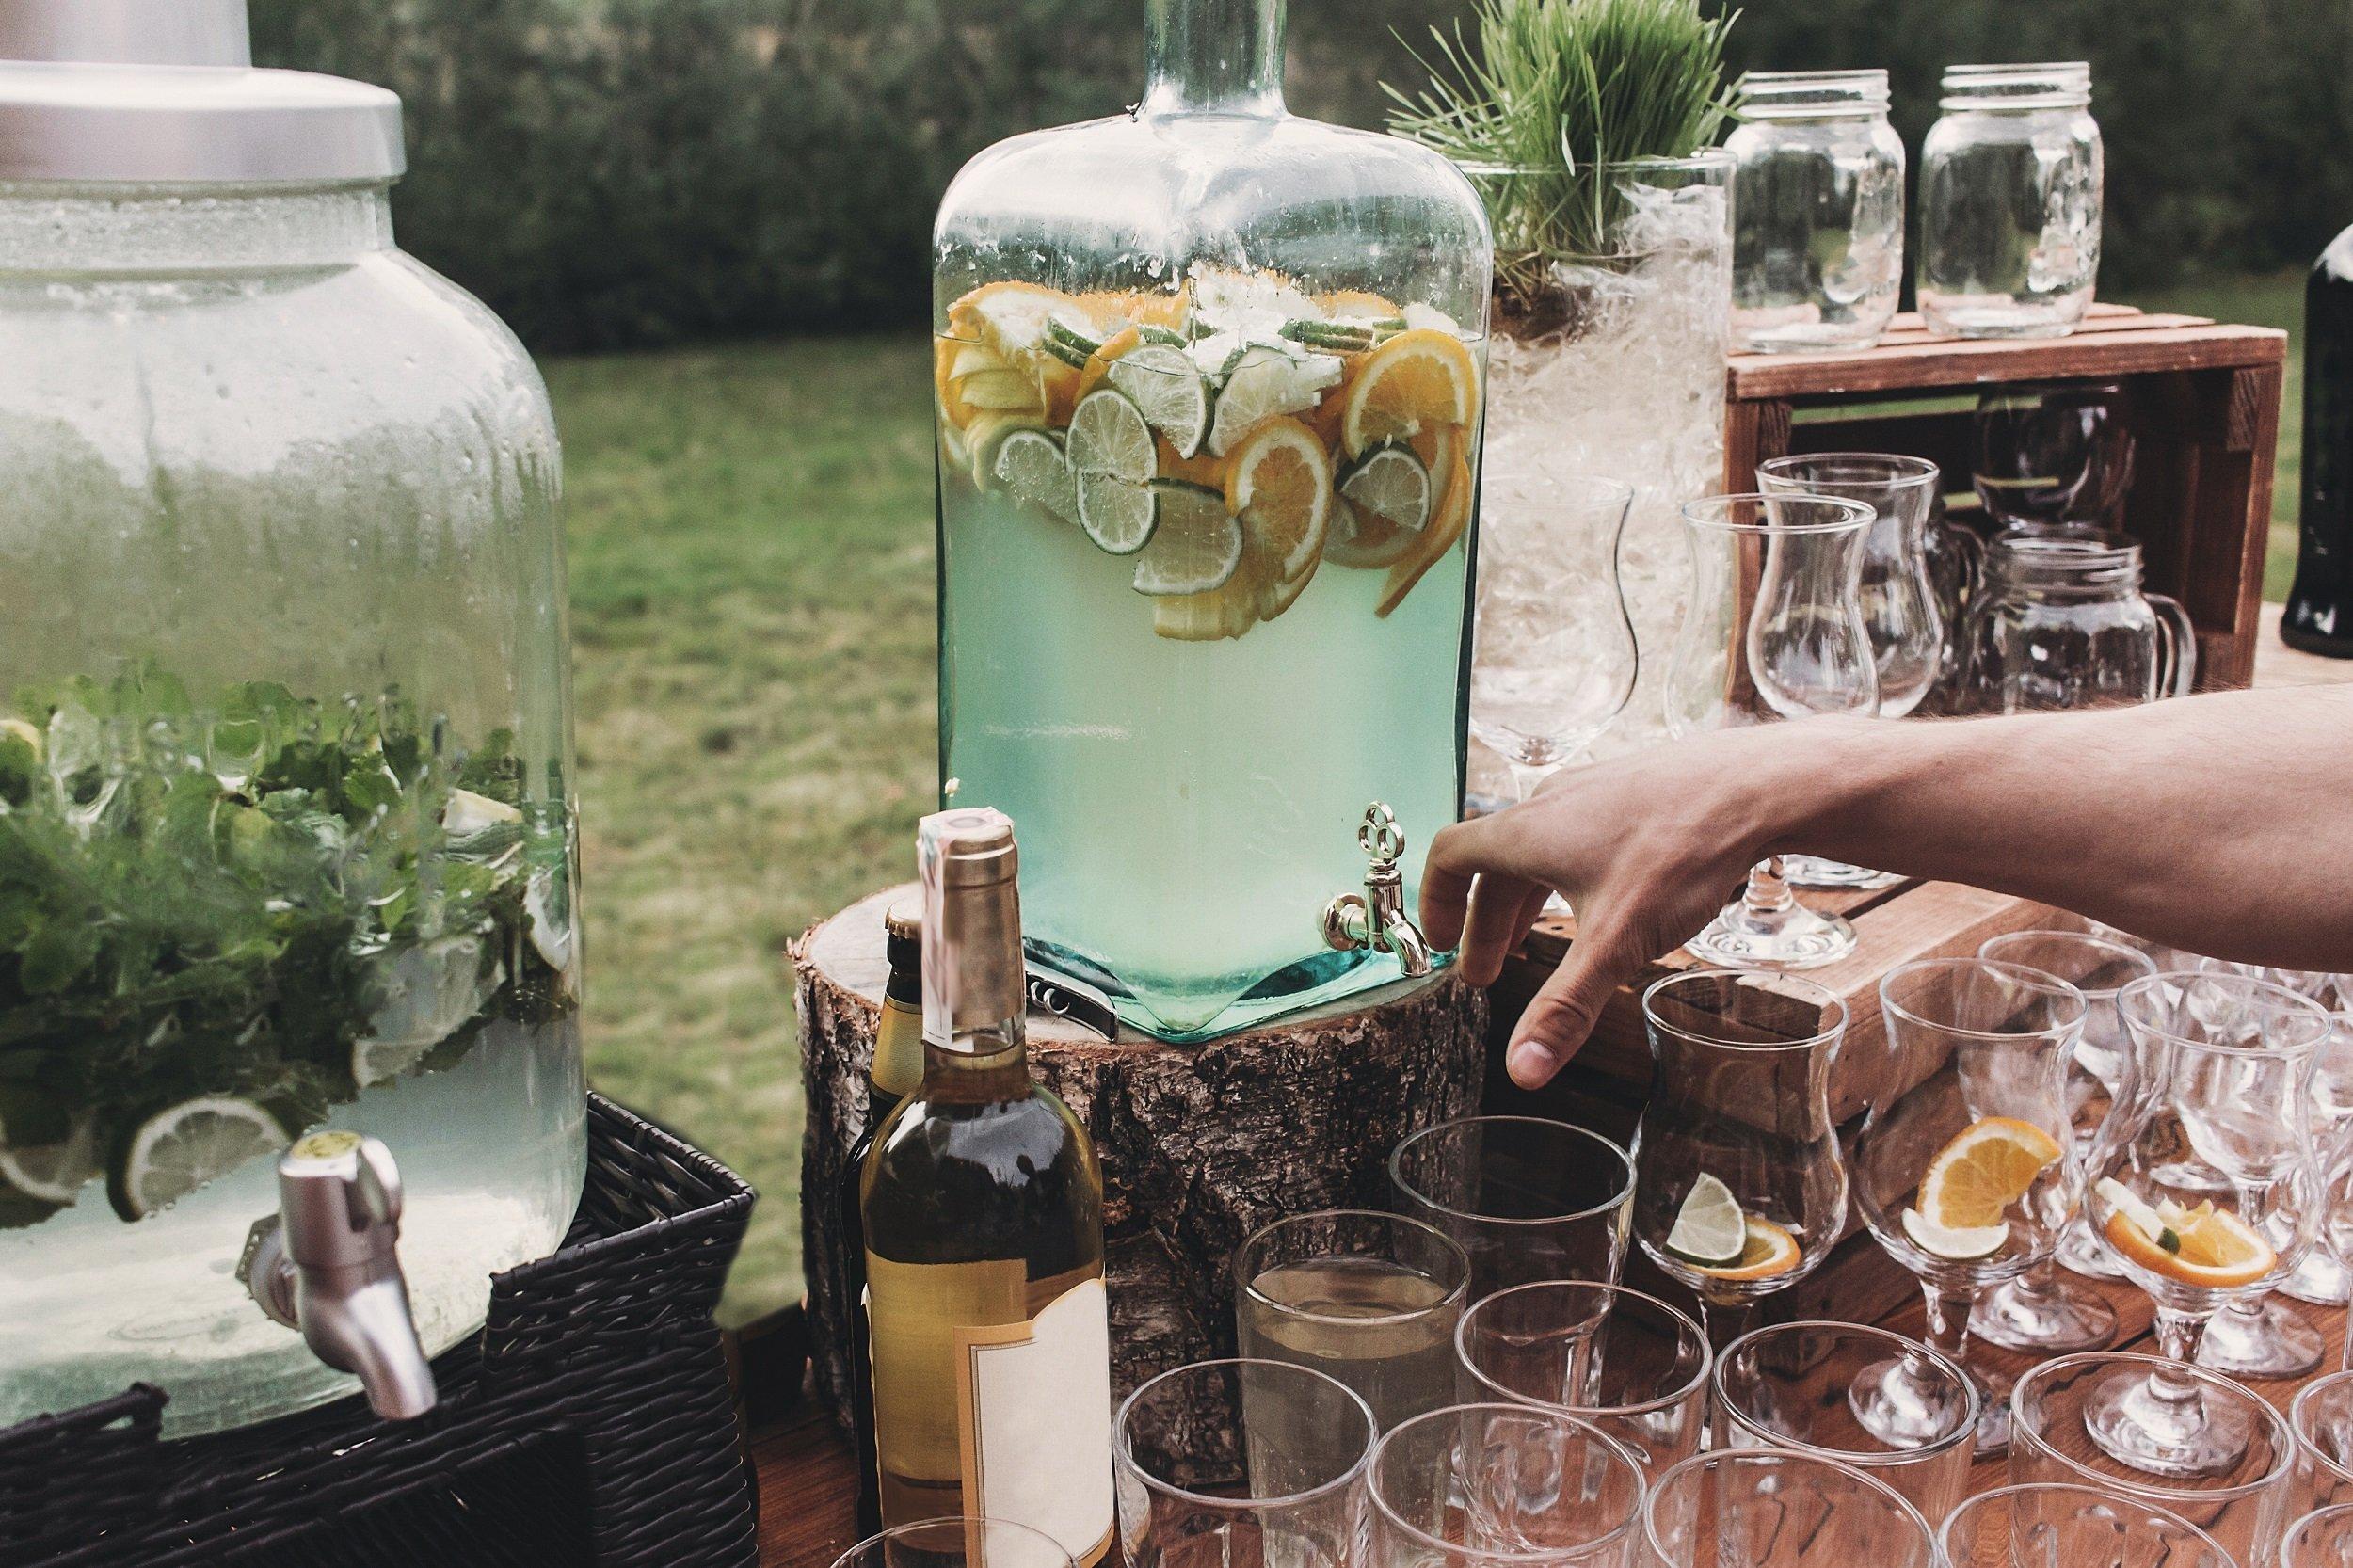 Serving drinks from garden bar